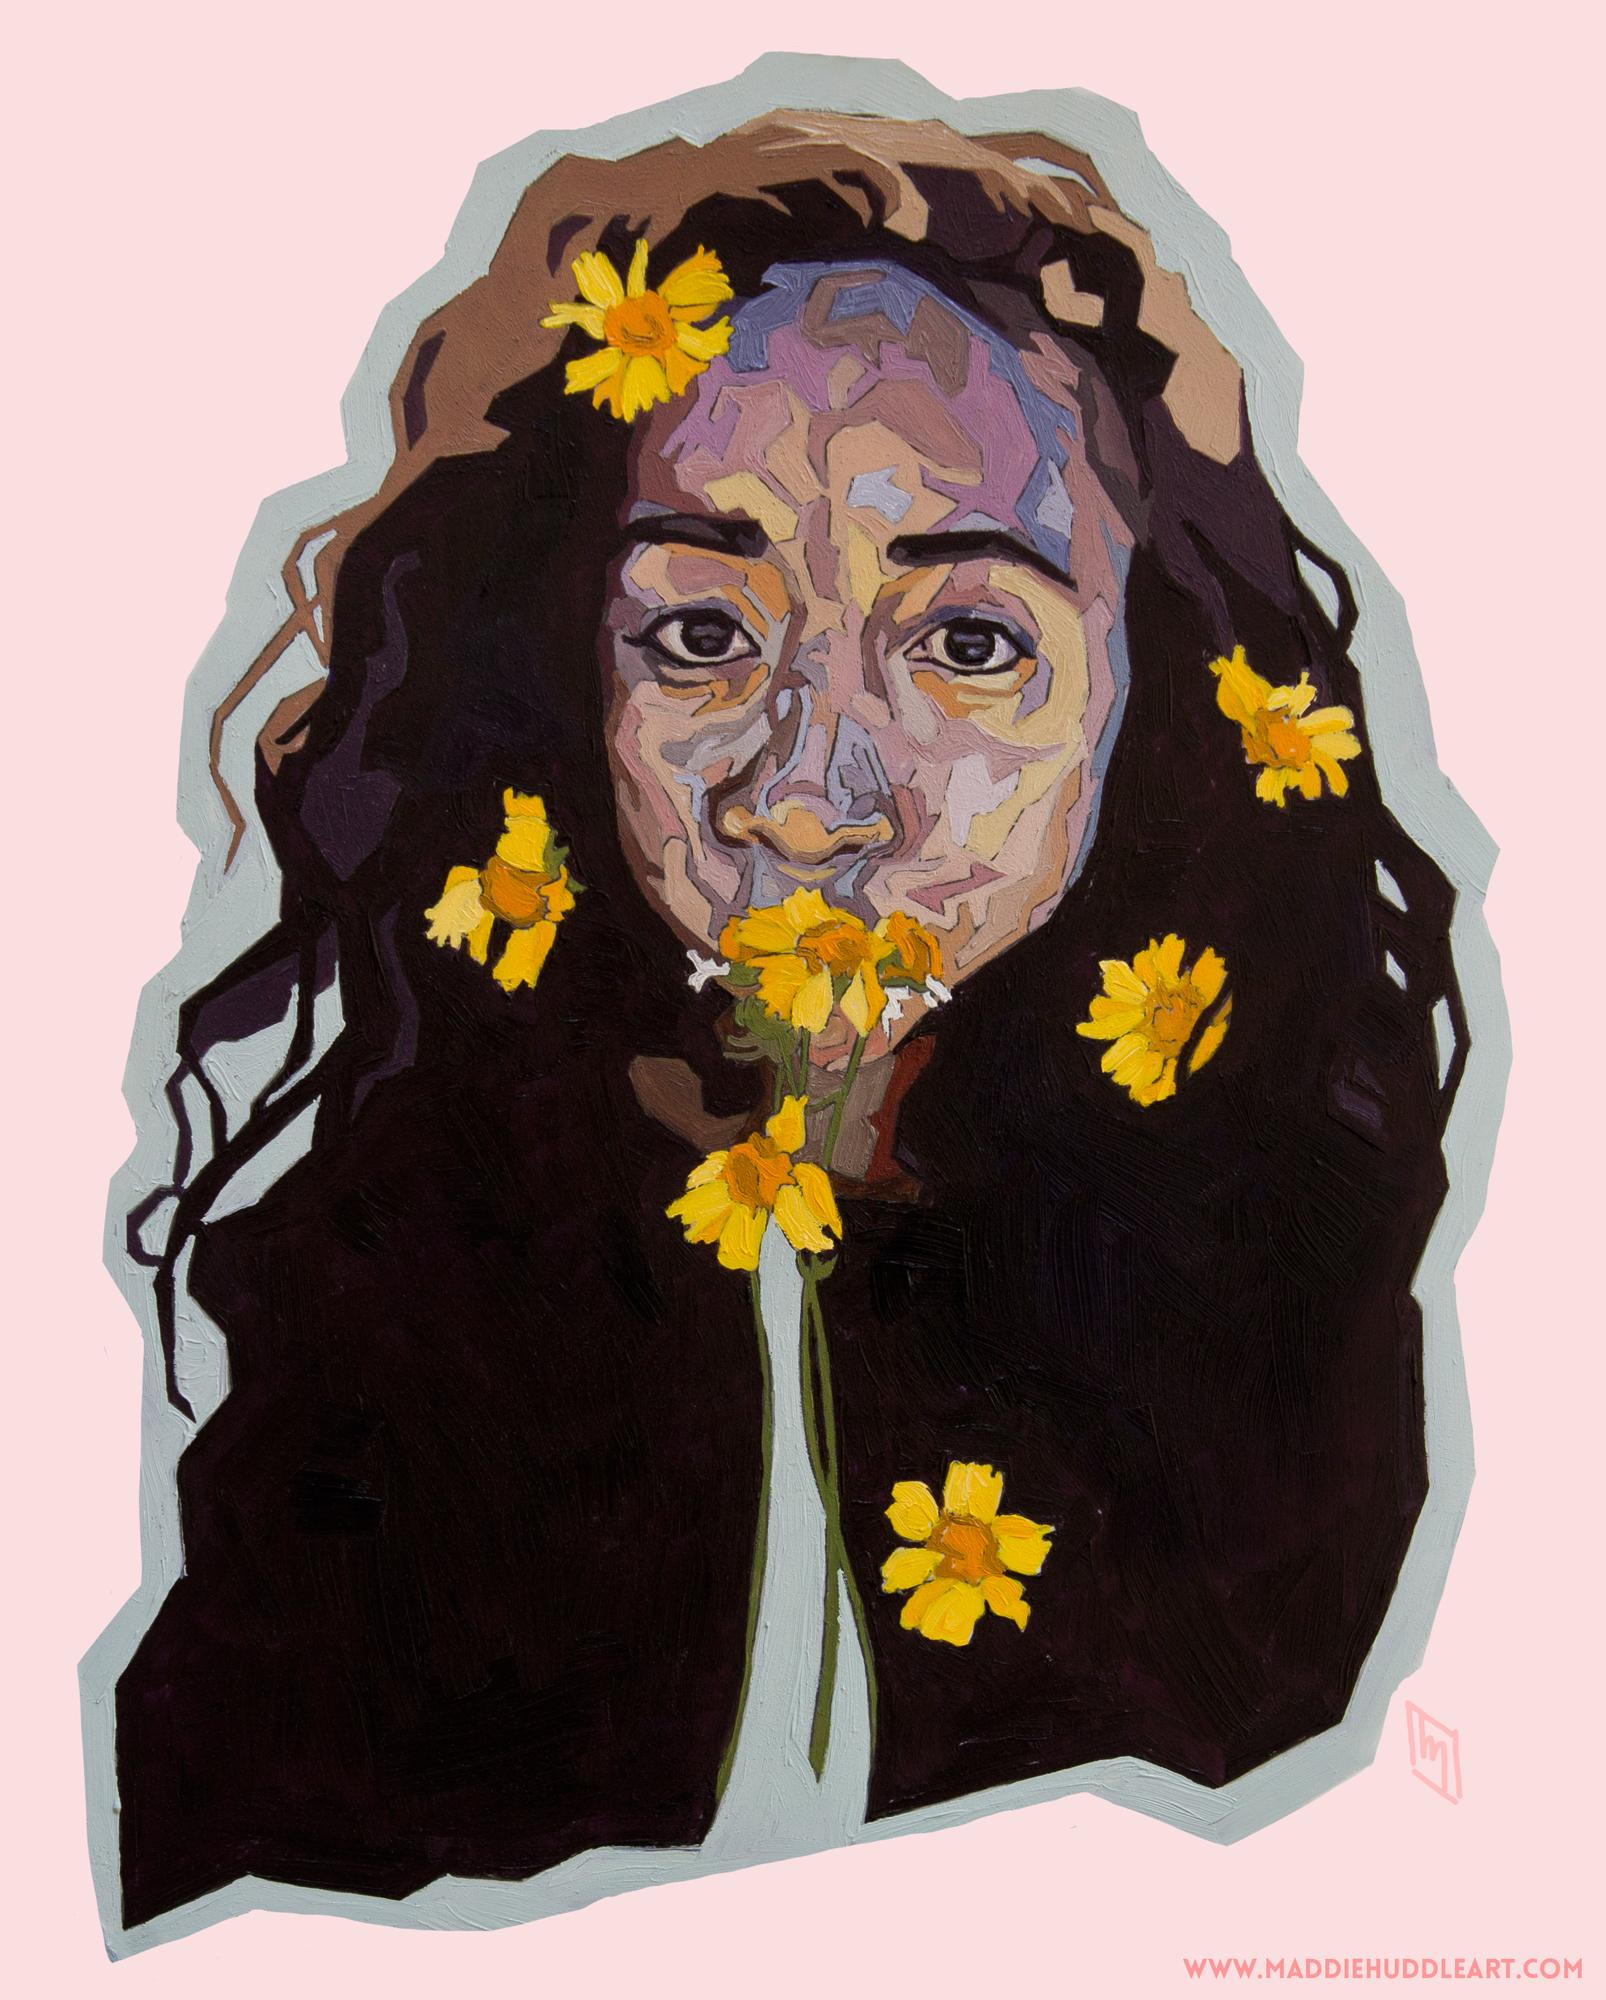 MaddieHuddleArt_Chroma7_oilpaint_portrait.jpg